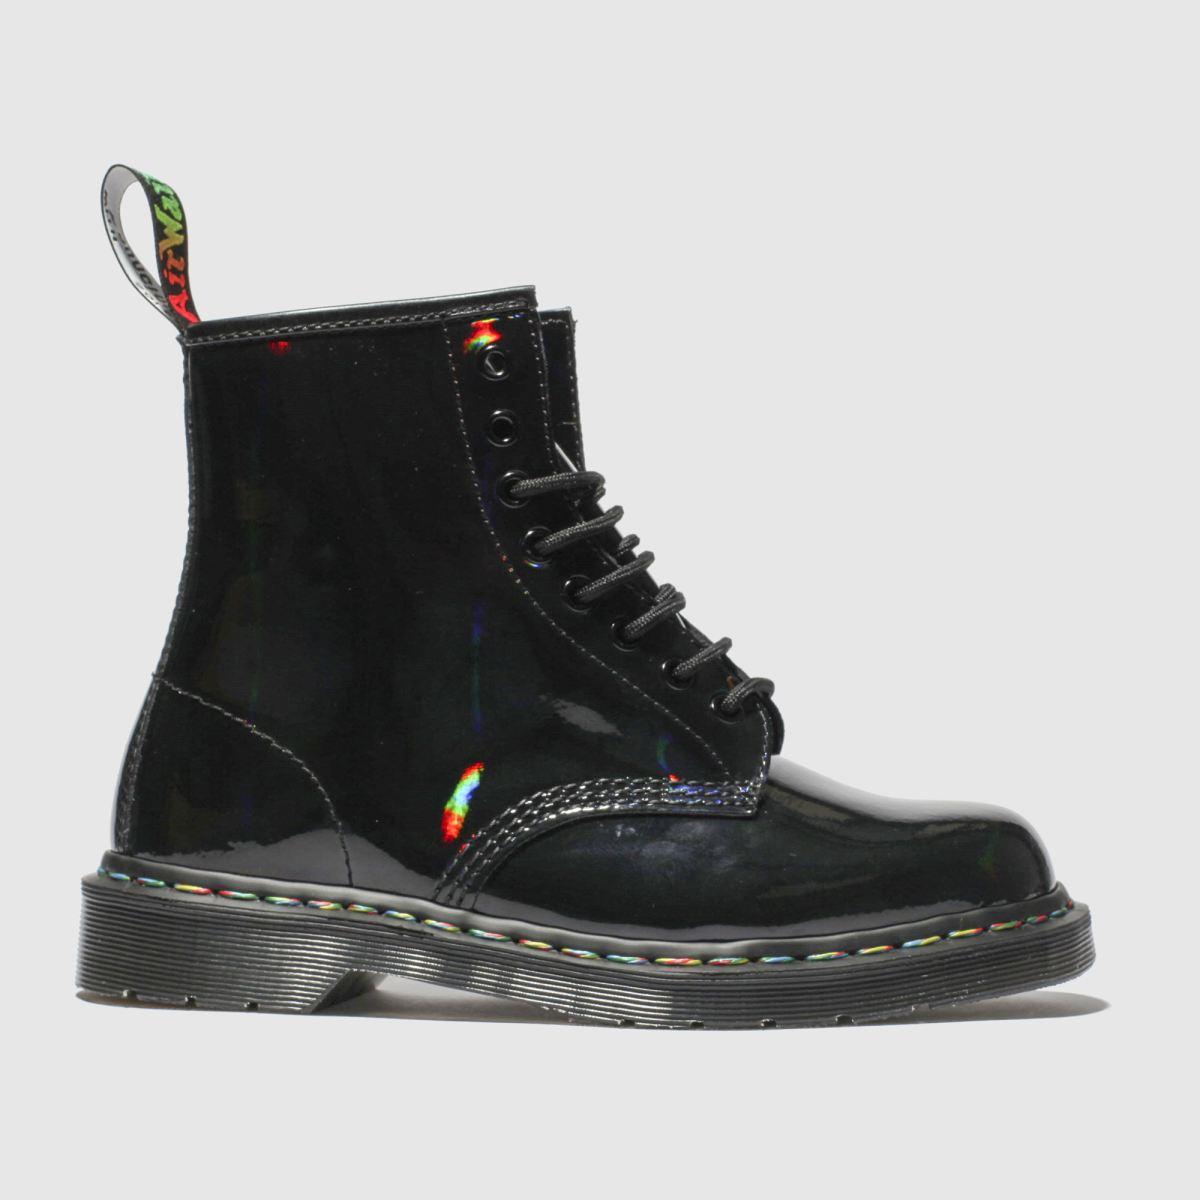 Dr Martens Black 1460 8 Eye Rainbow Boot Boots